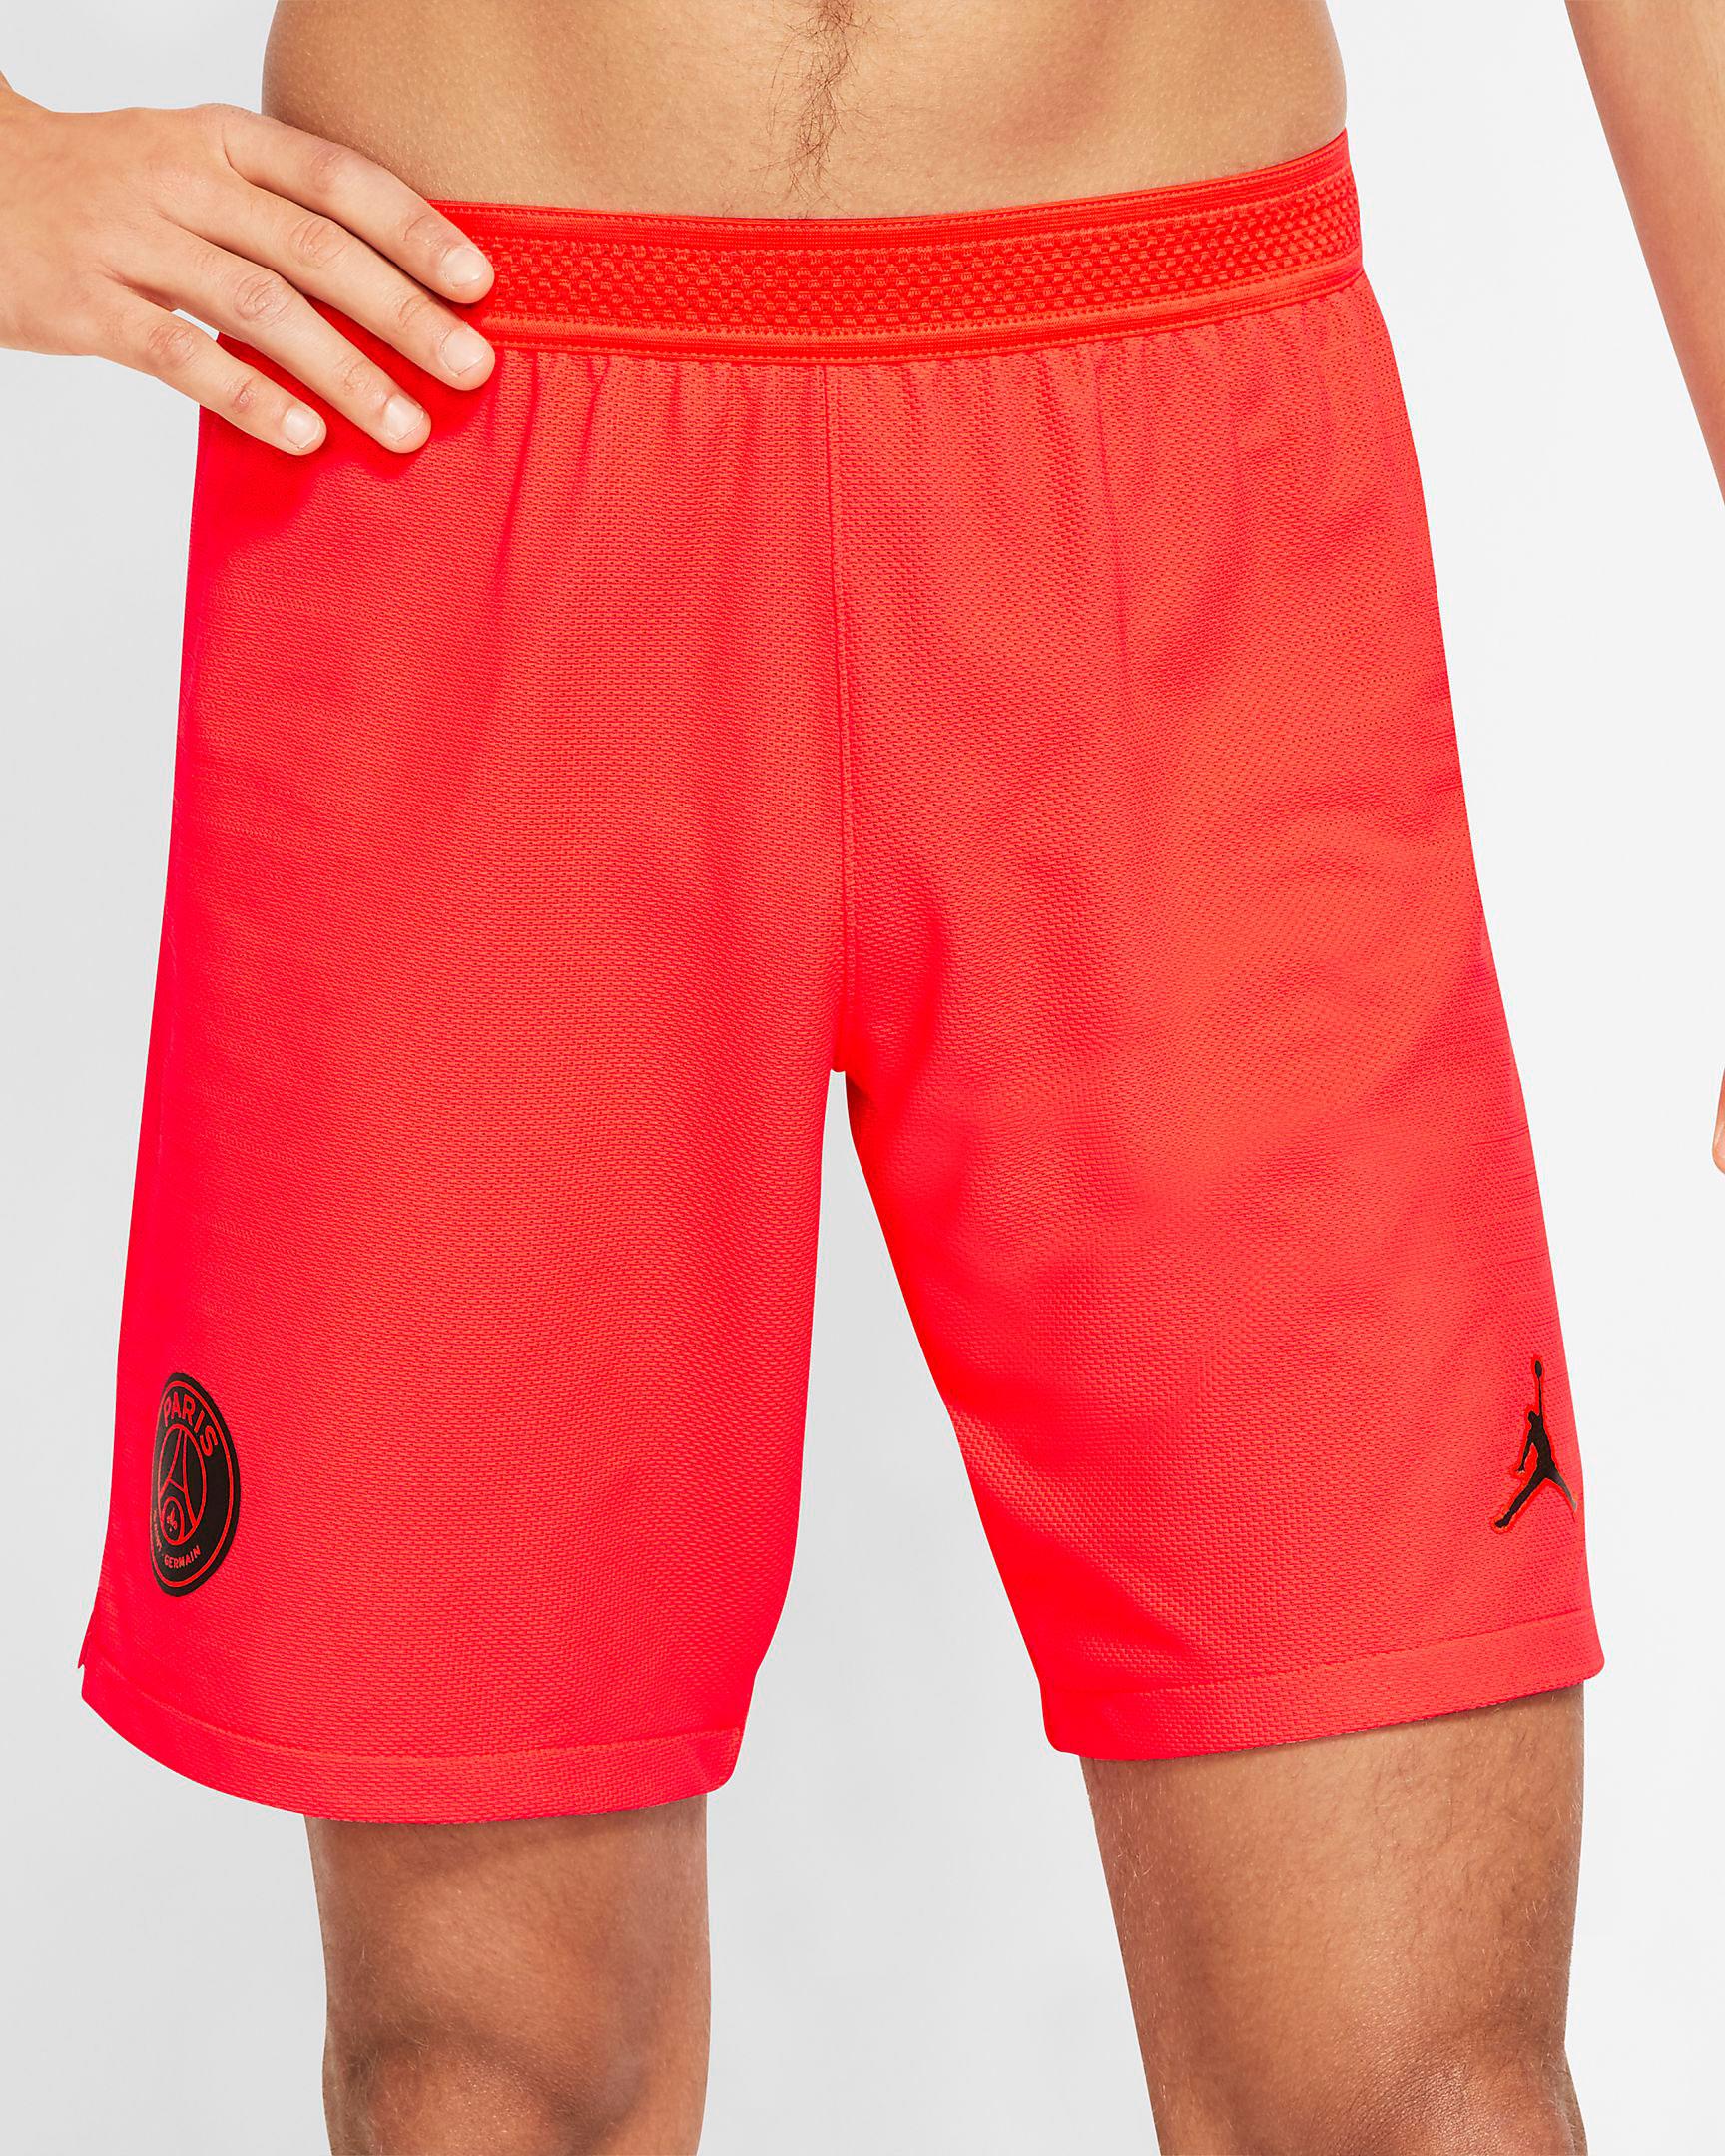 jordan-psg-paris-saint-germain-infrared-shorts